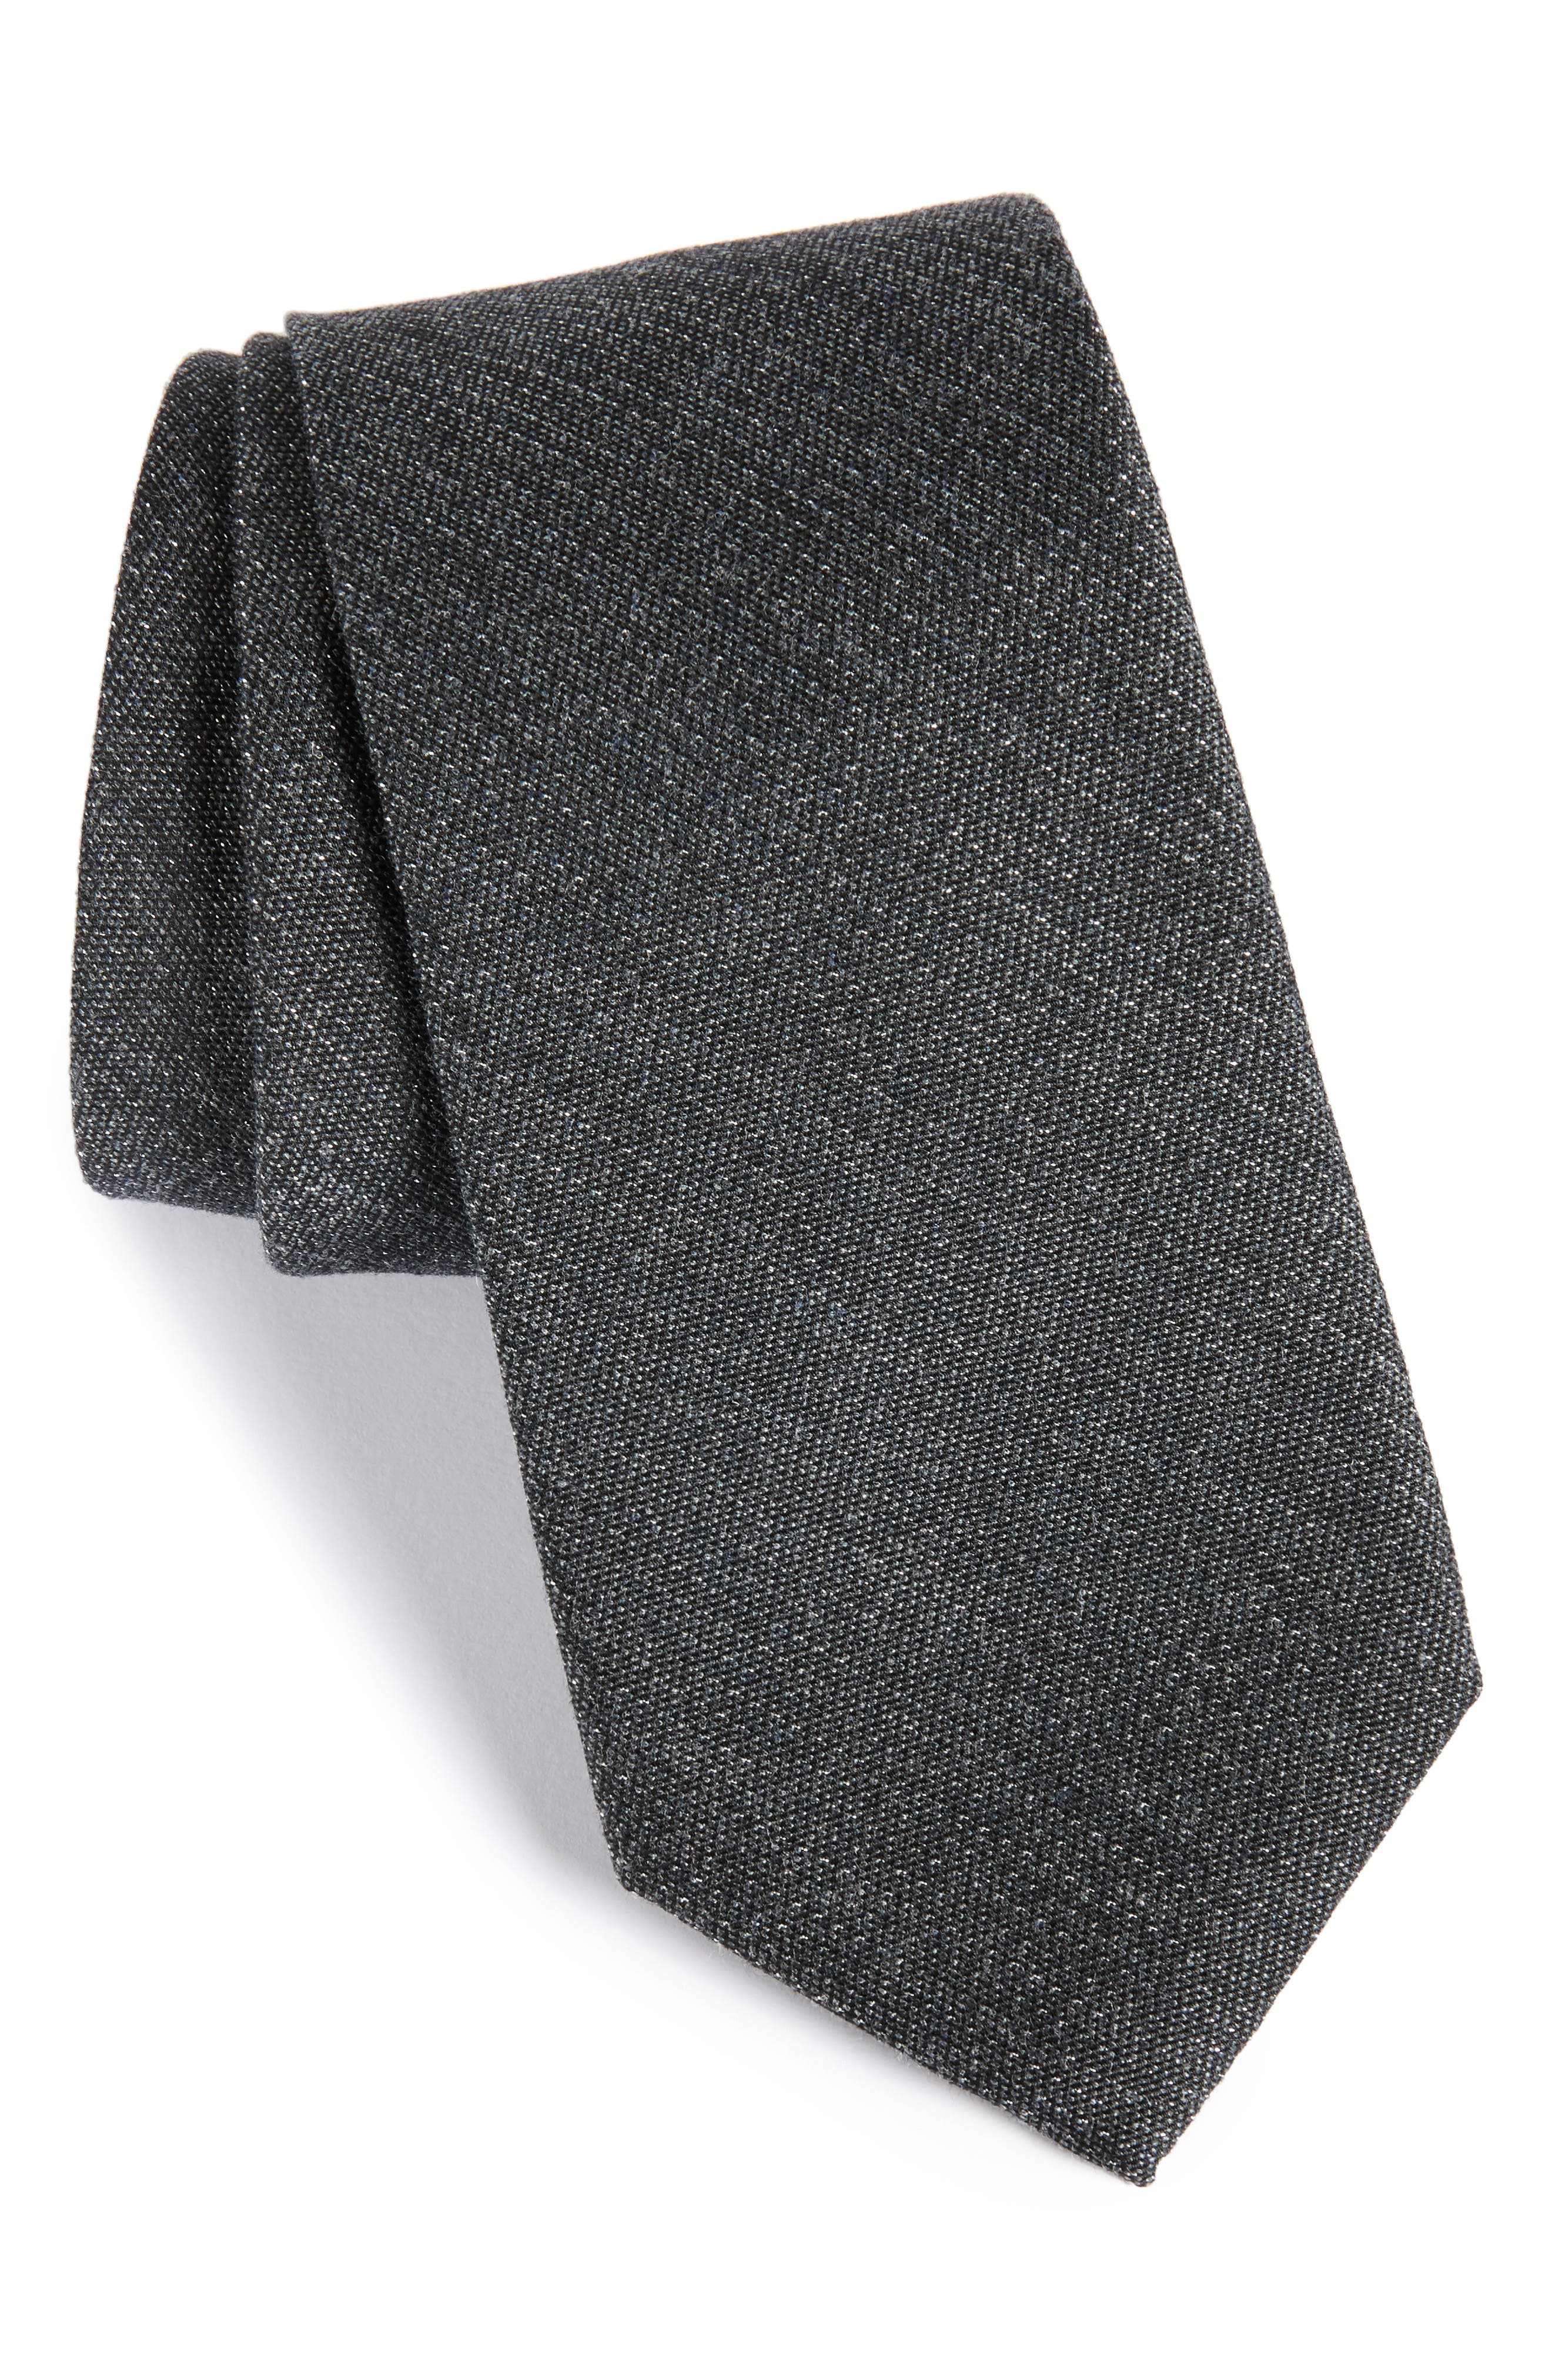 Resolution Silk Blend Tie,                             Main thumbnail 1, color,                             001